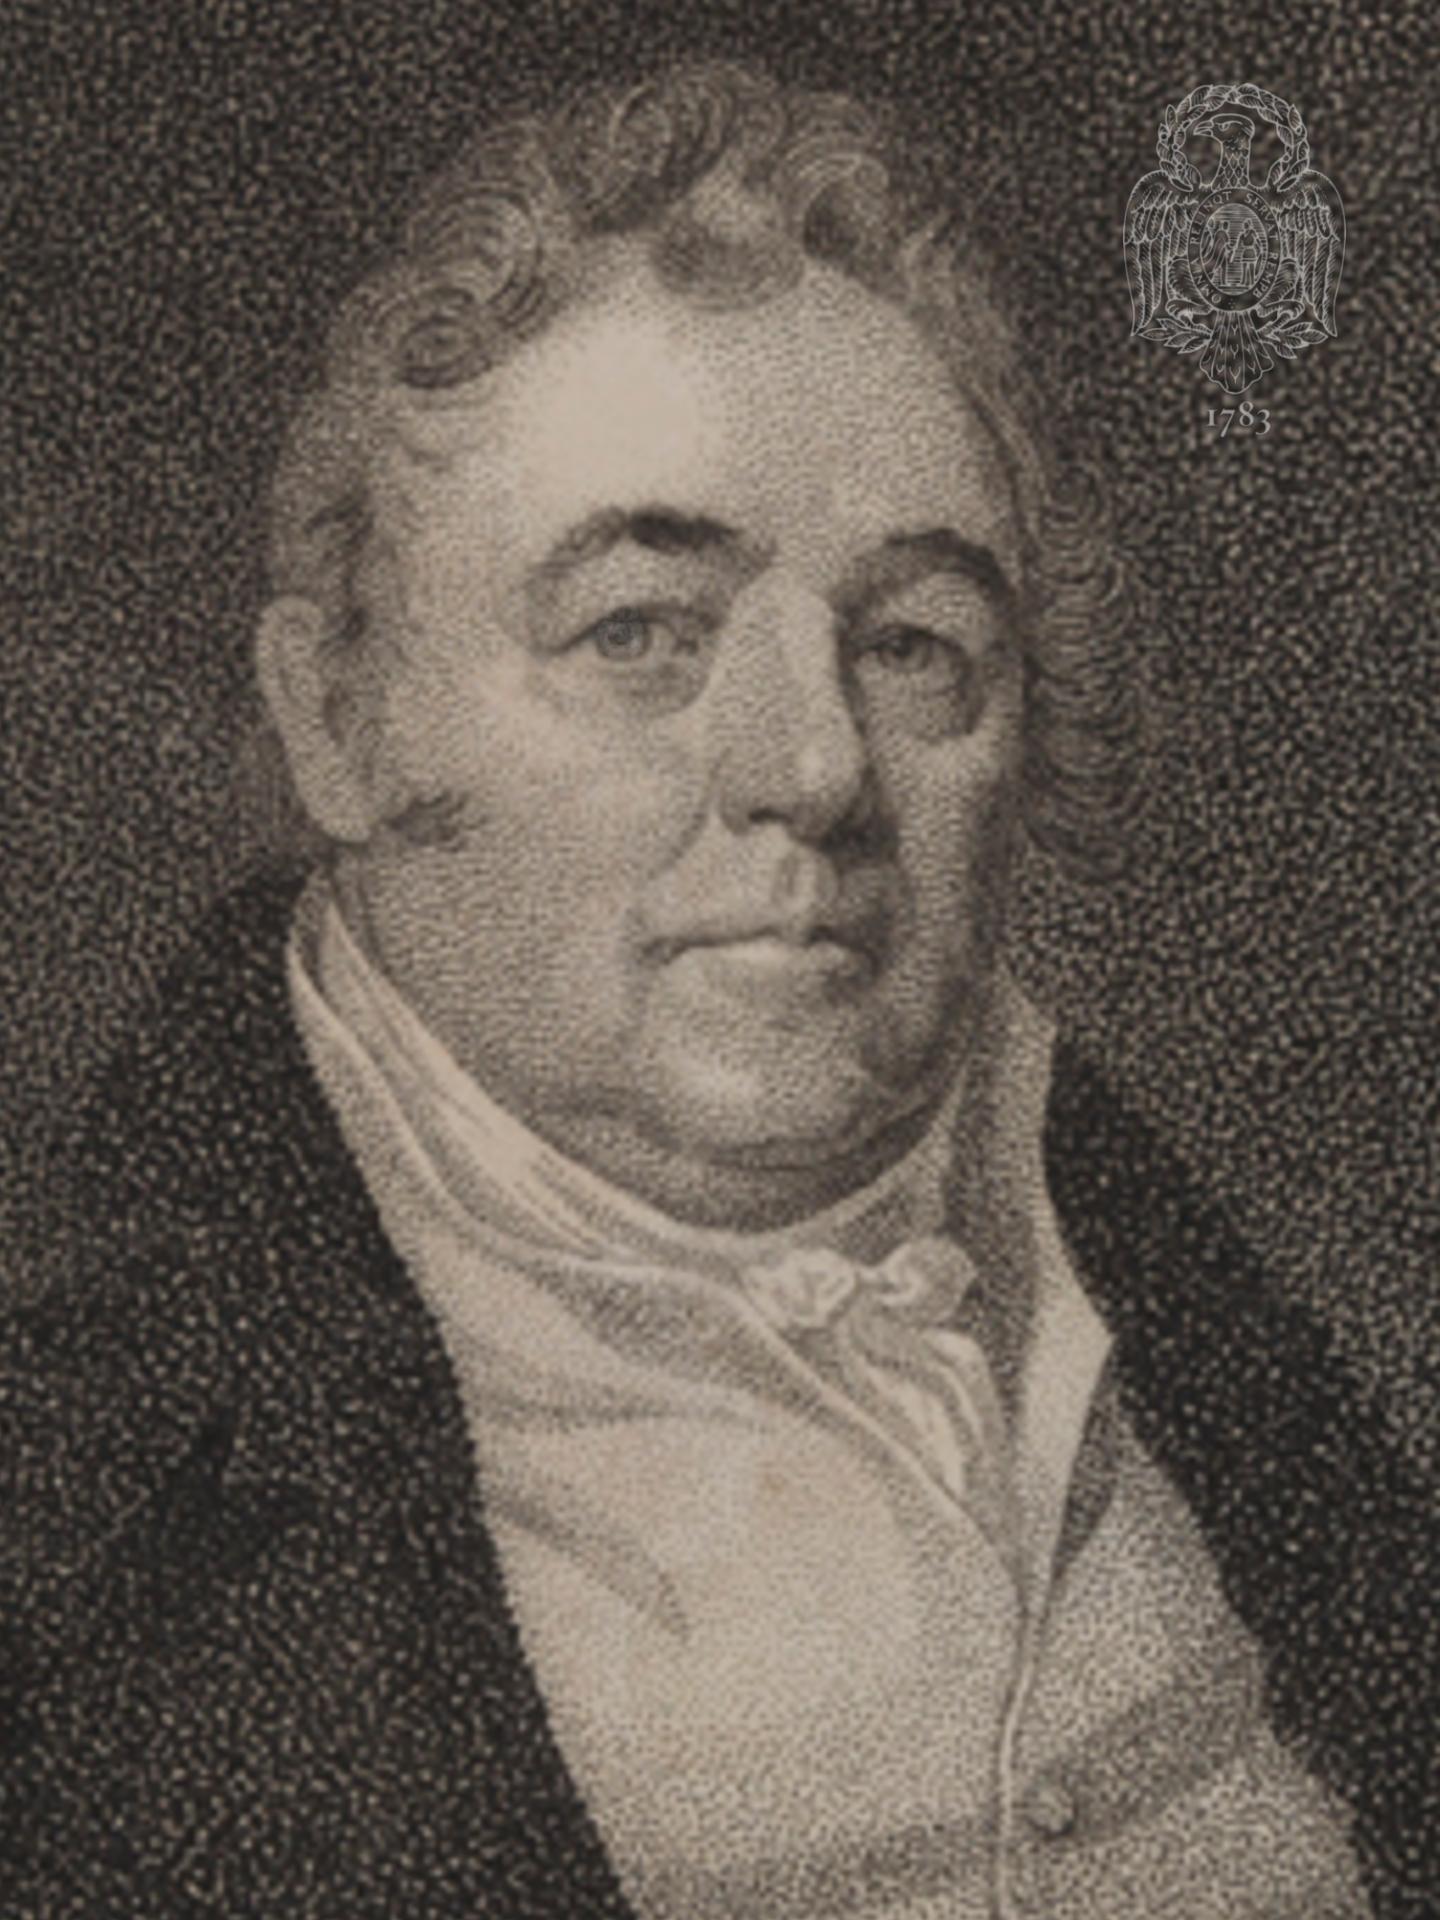 Capt. Richard Dale, Continental Navy